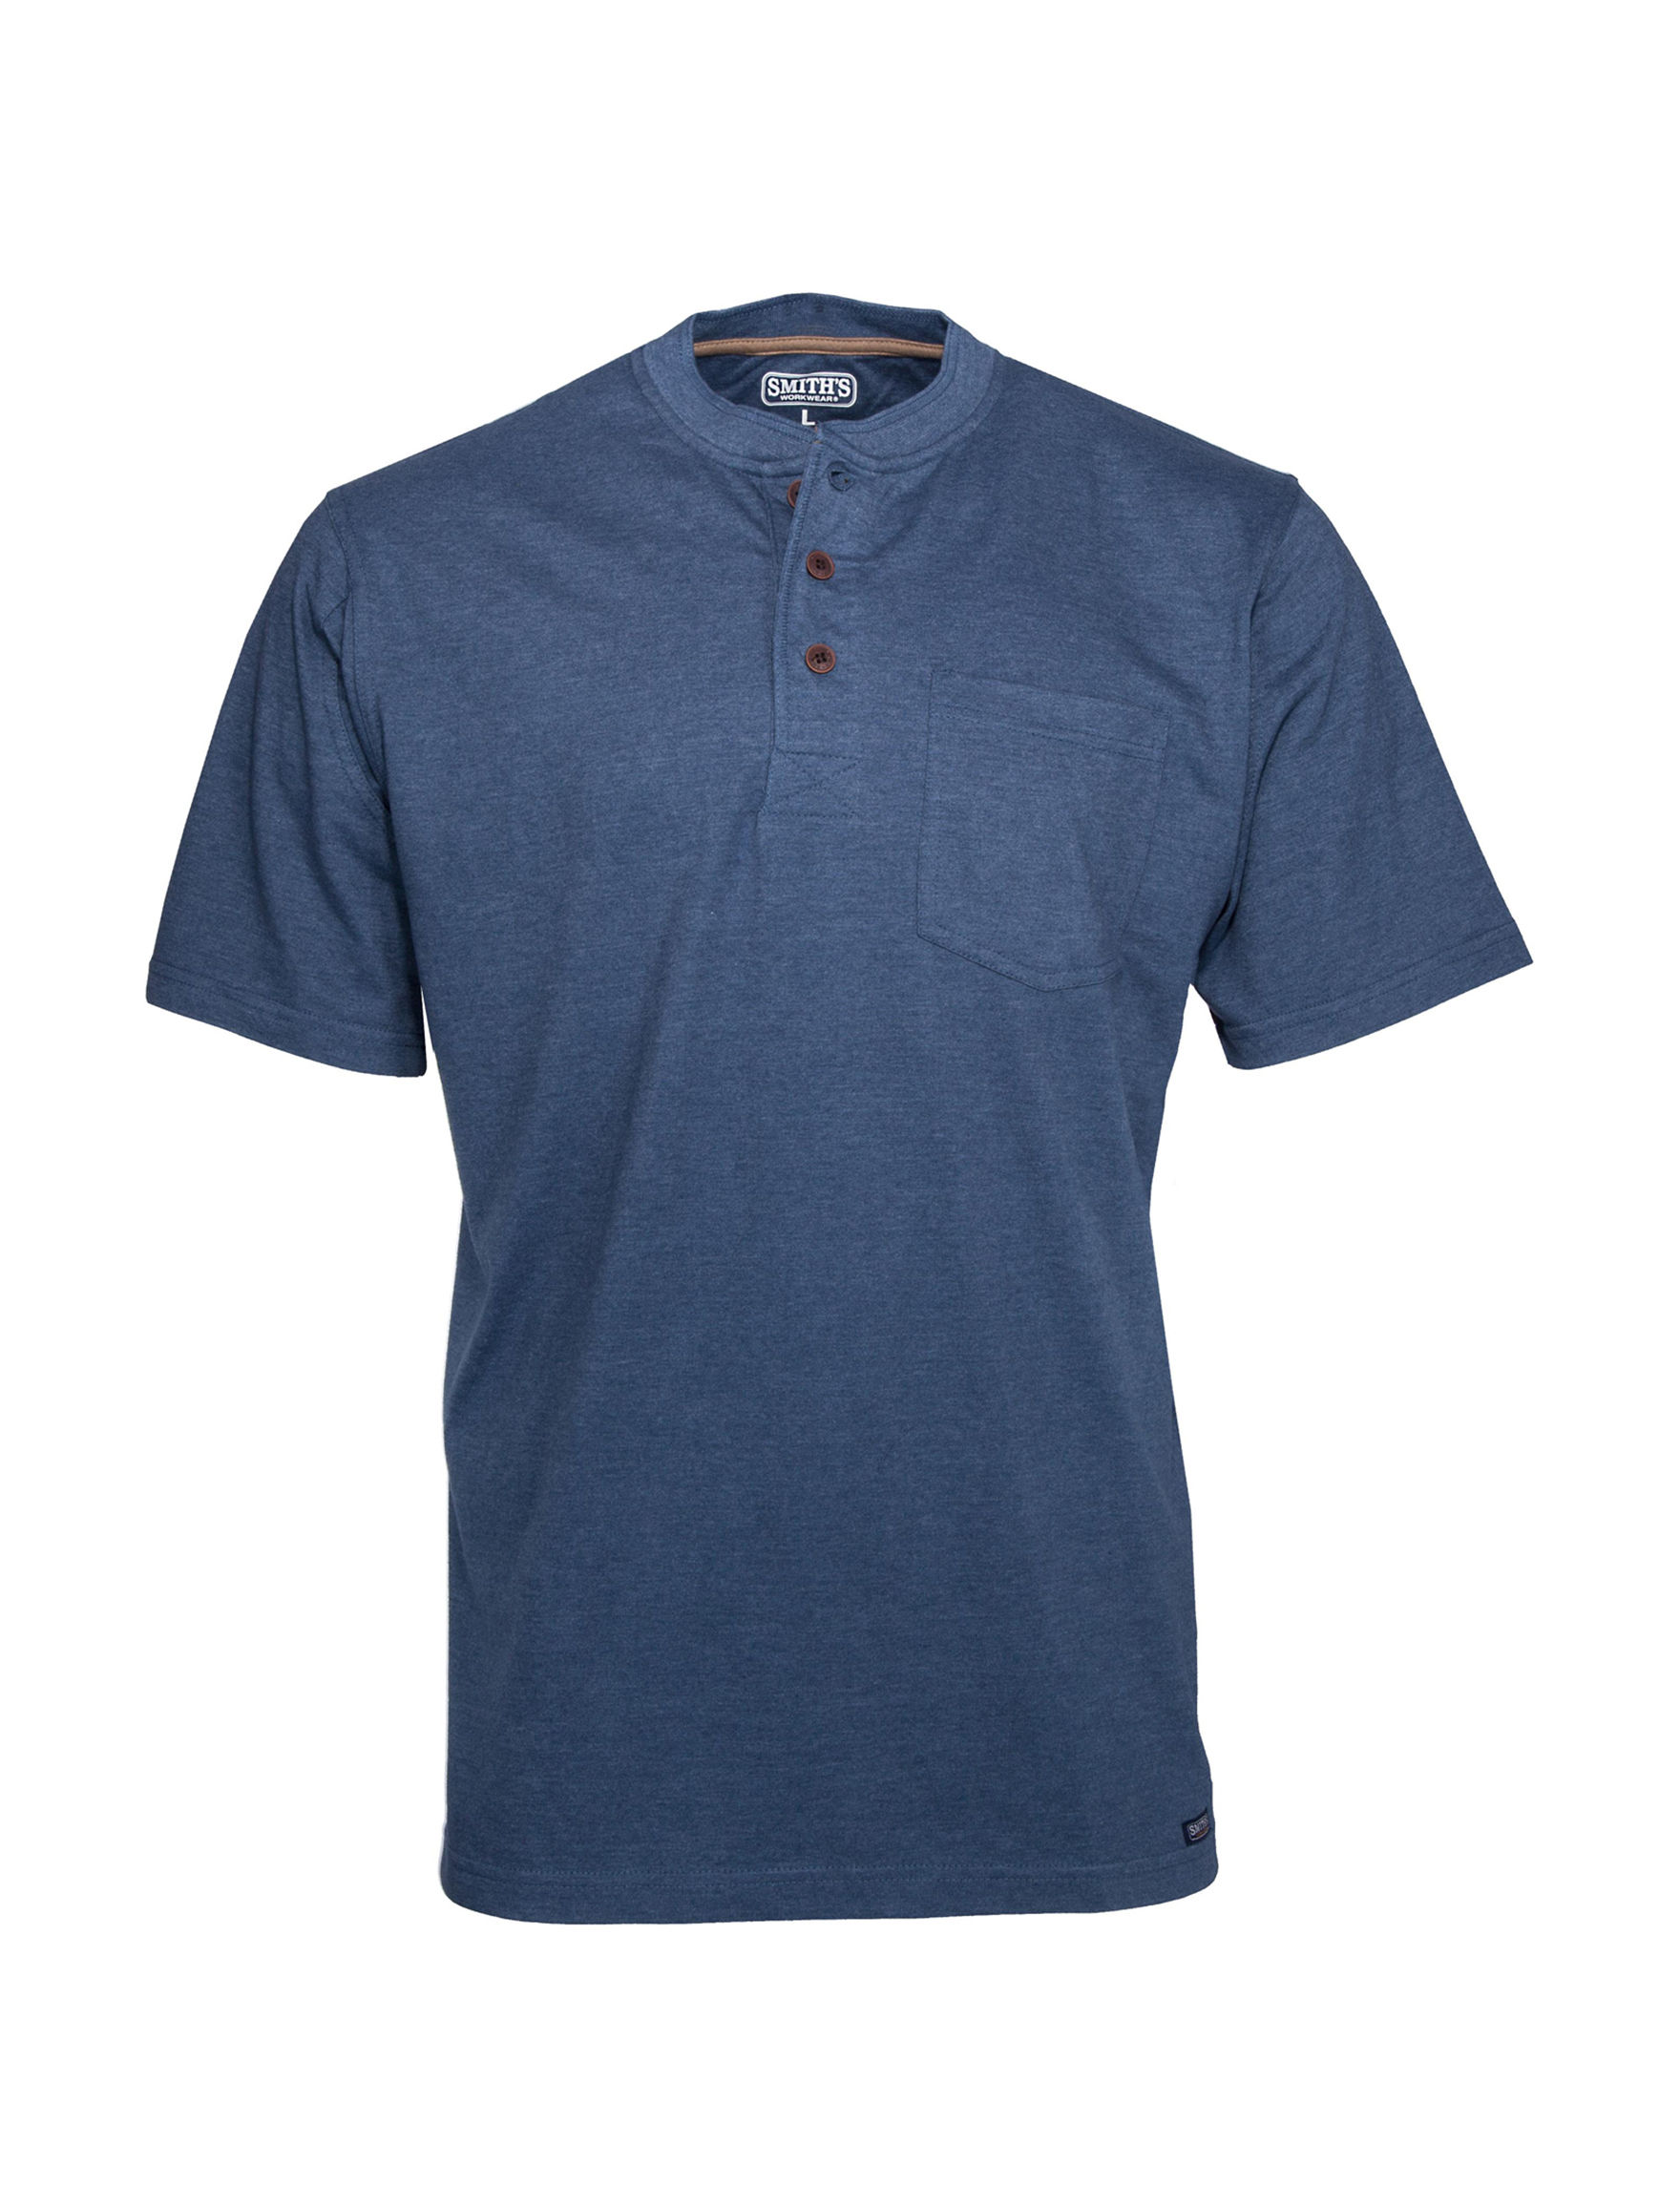 Smith's Workwear Blue Heather Henleys